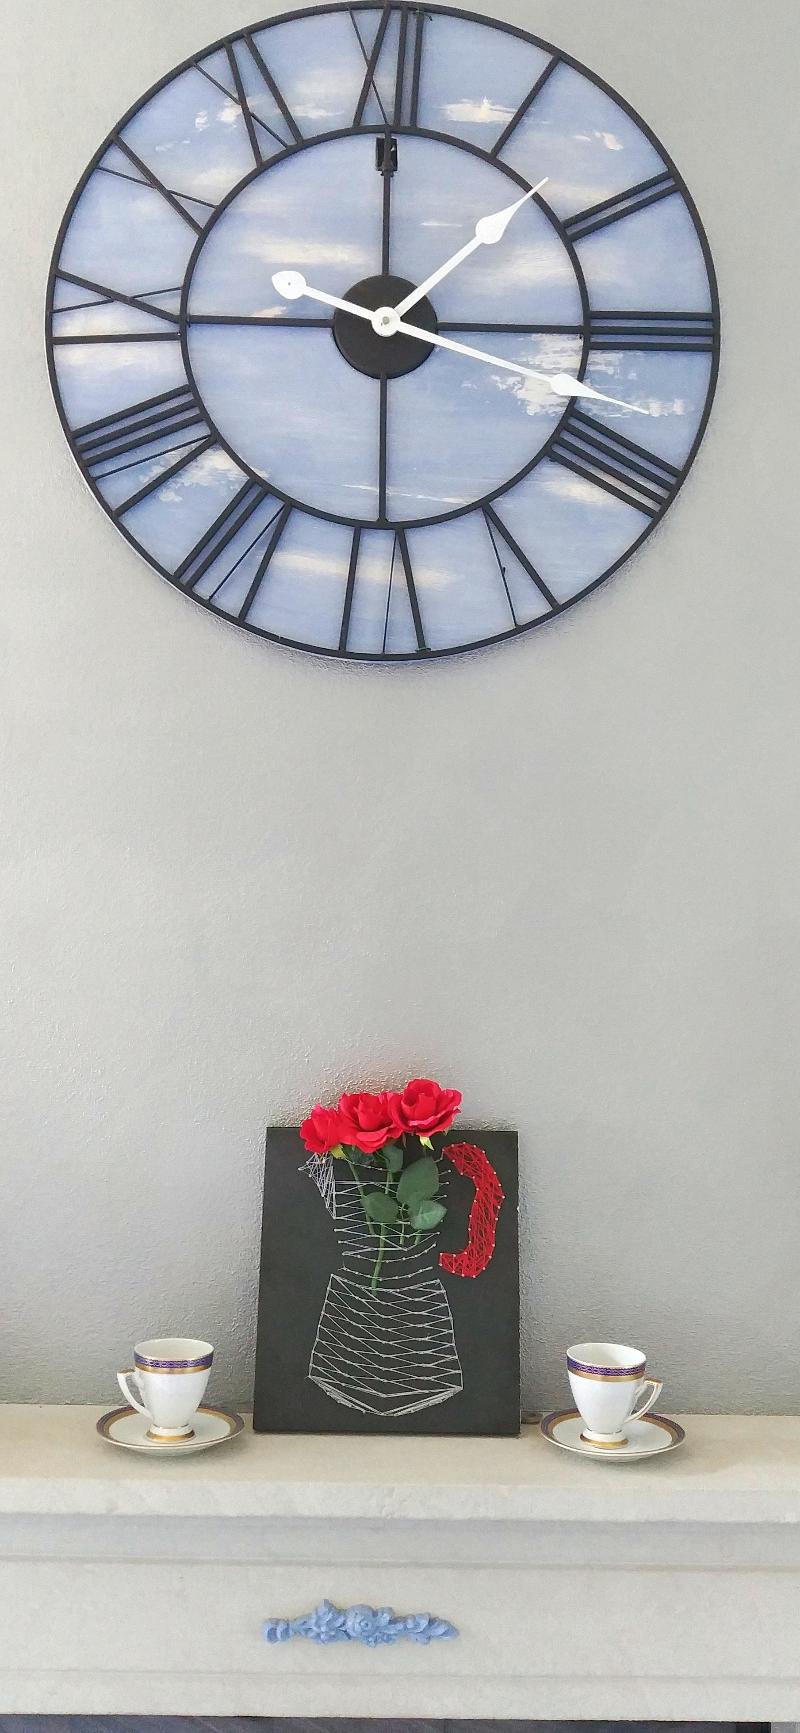 caffettieria-fiorita-moka-string-art